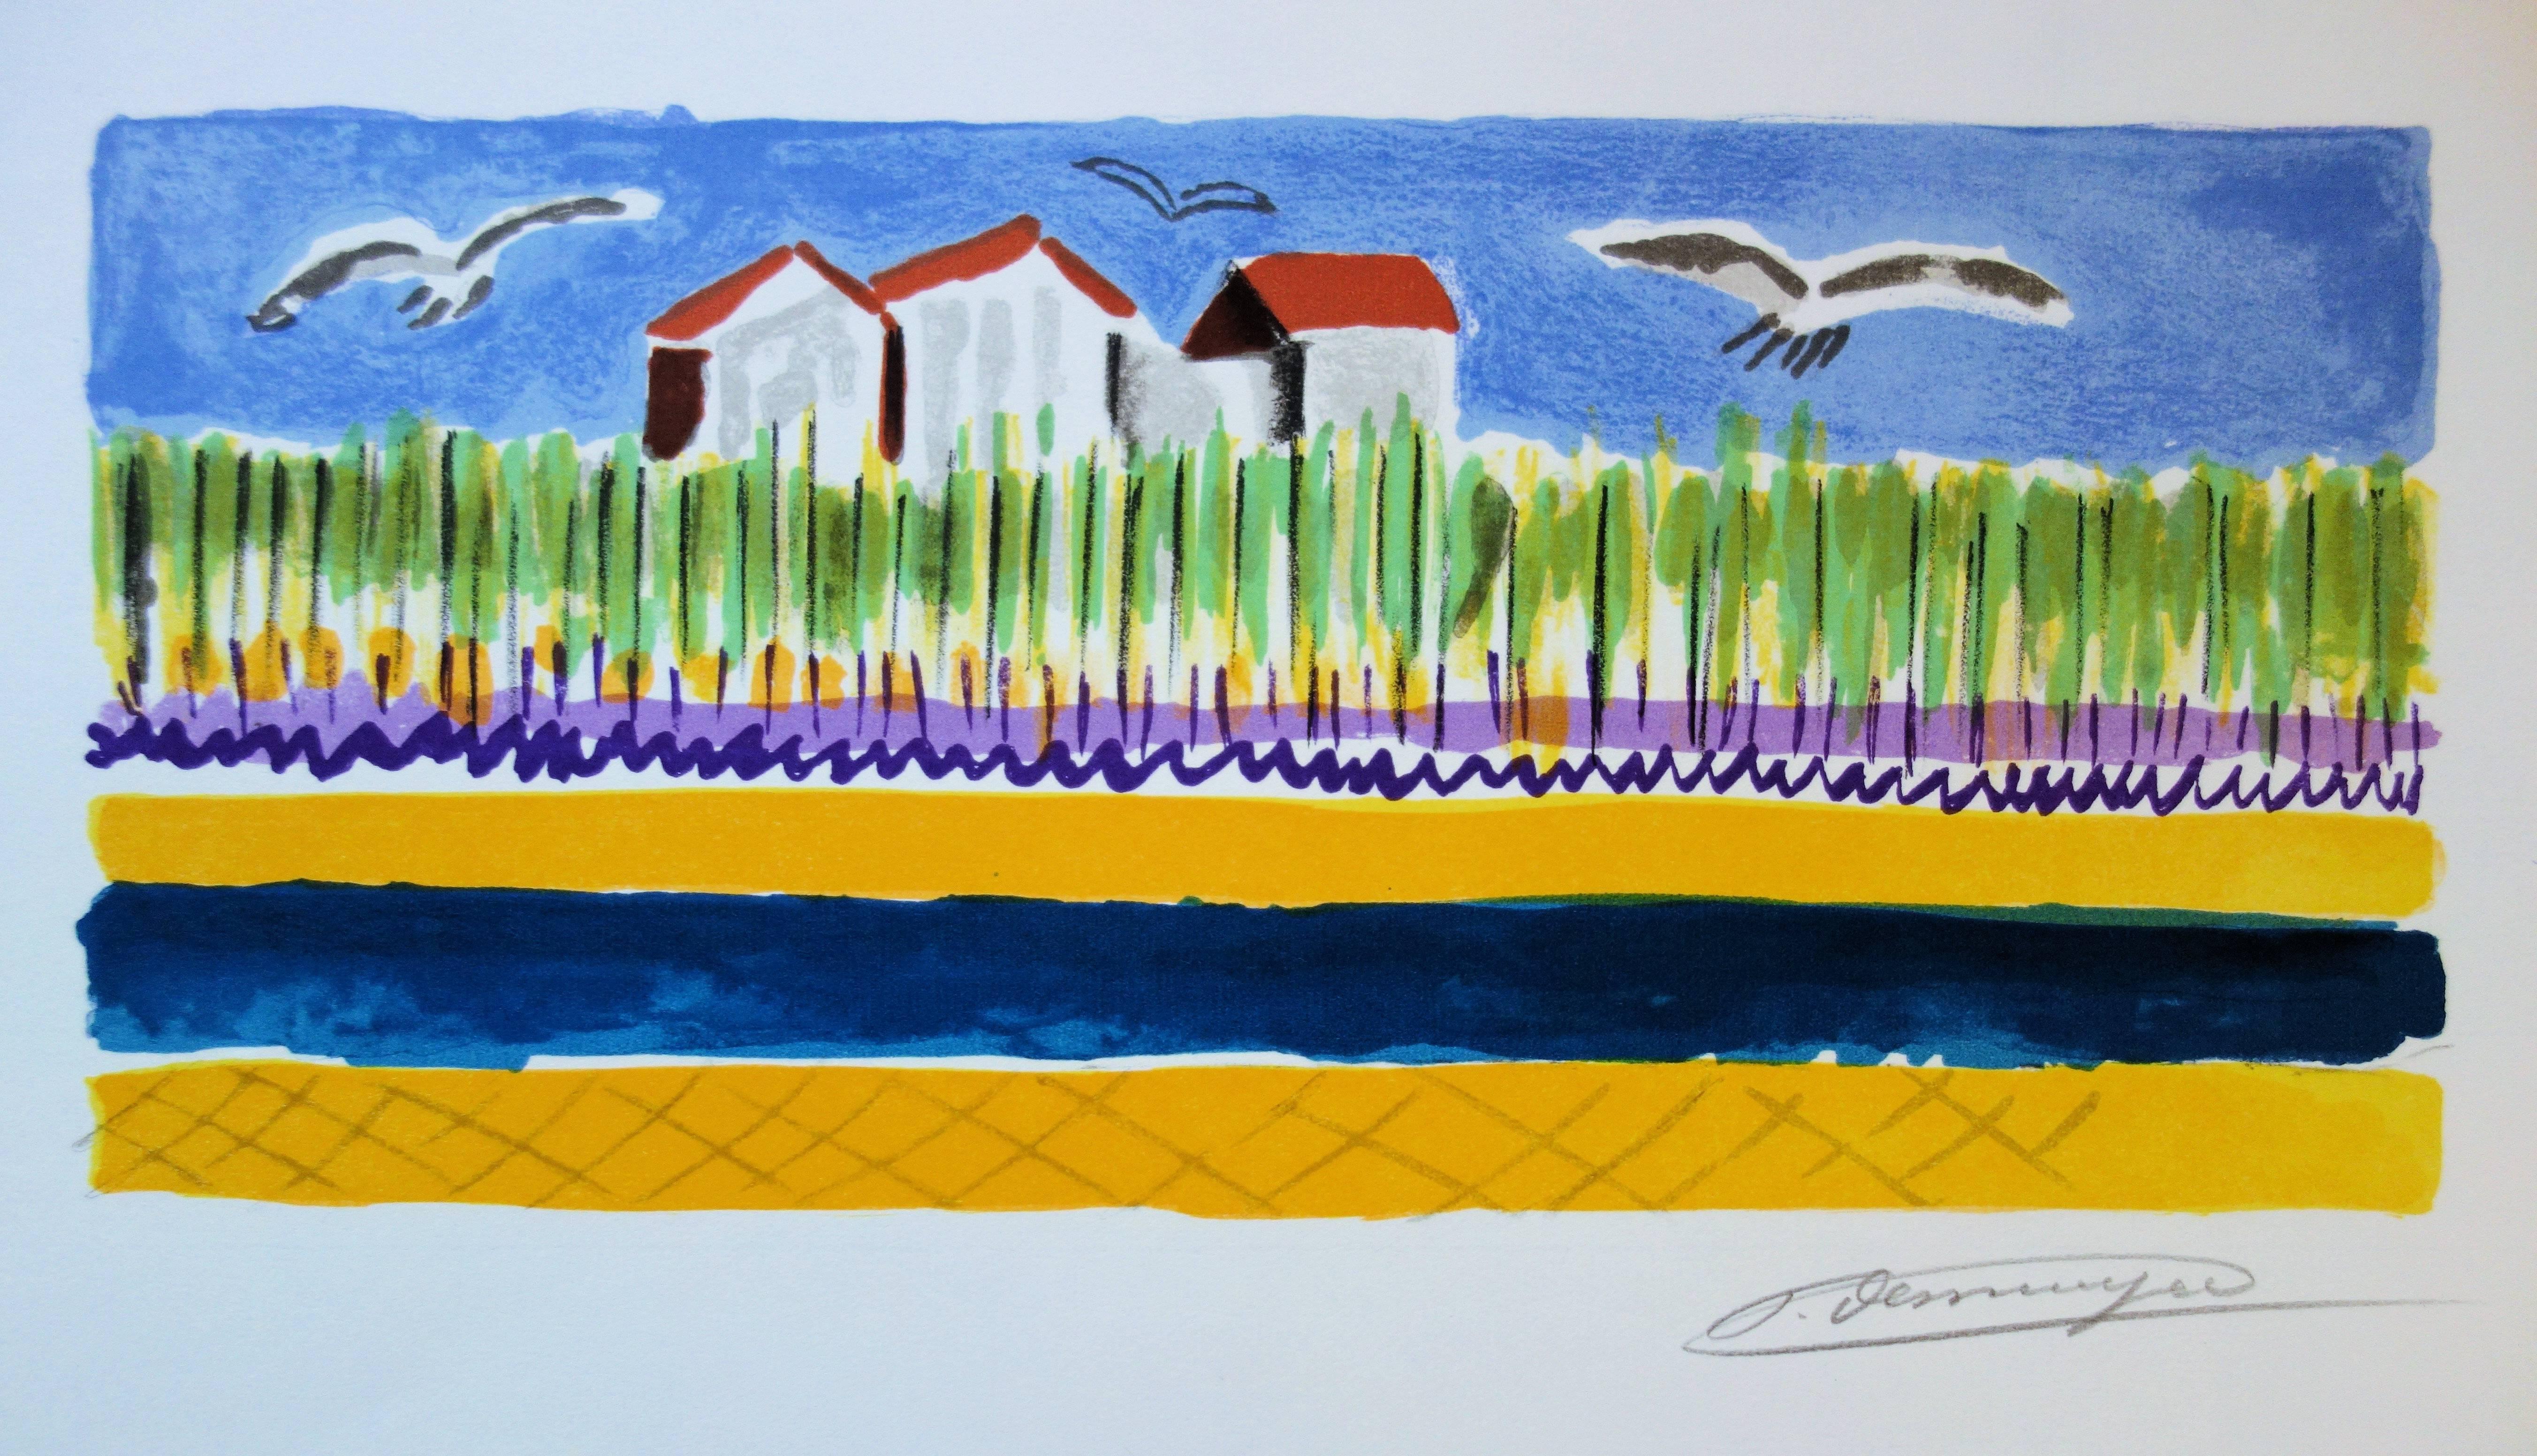 Small Houses near the Beach - Original handsigned lithograph